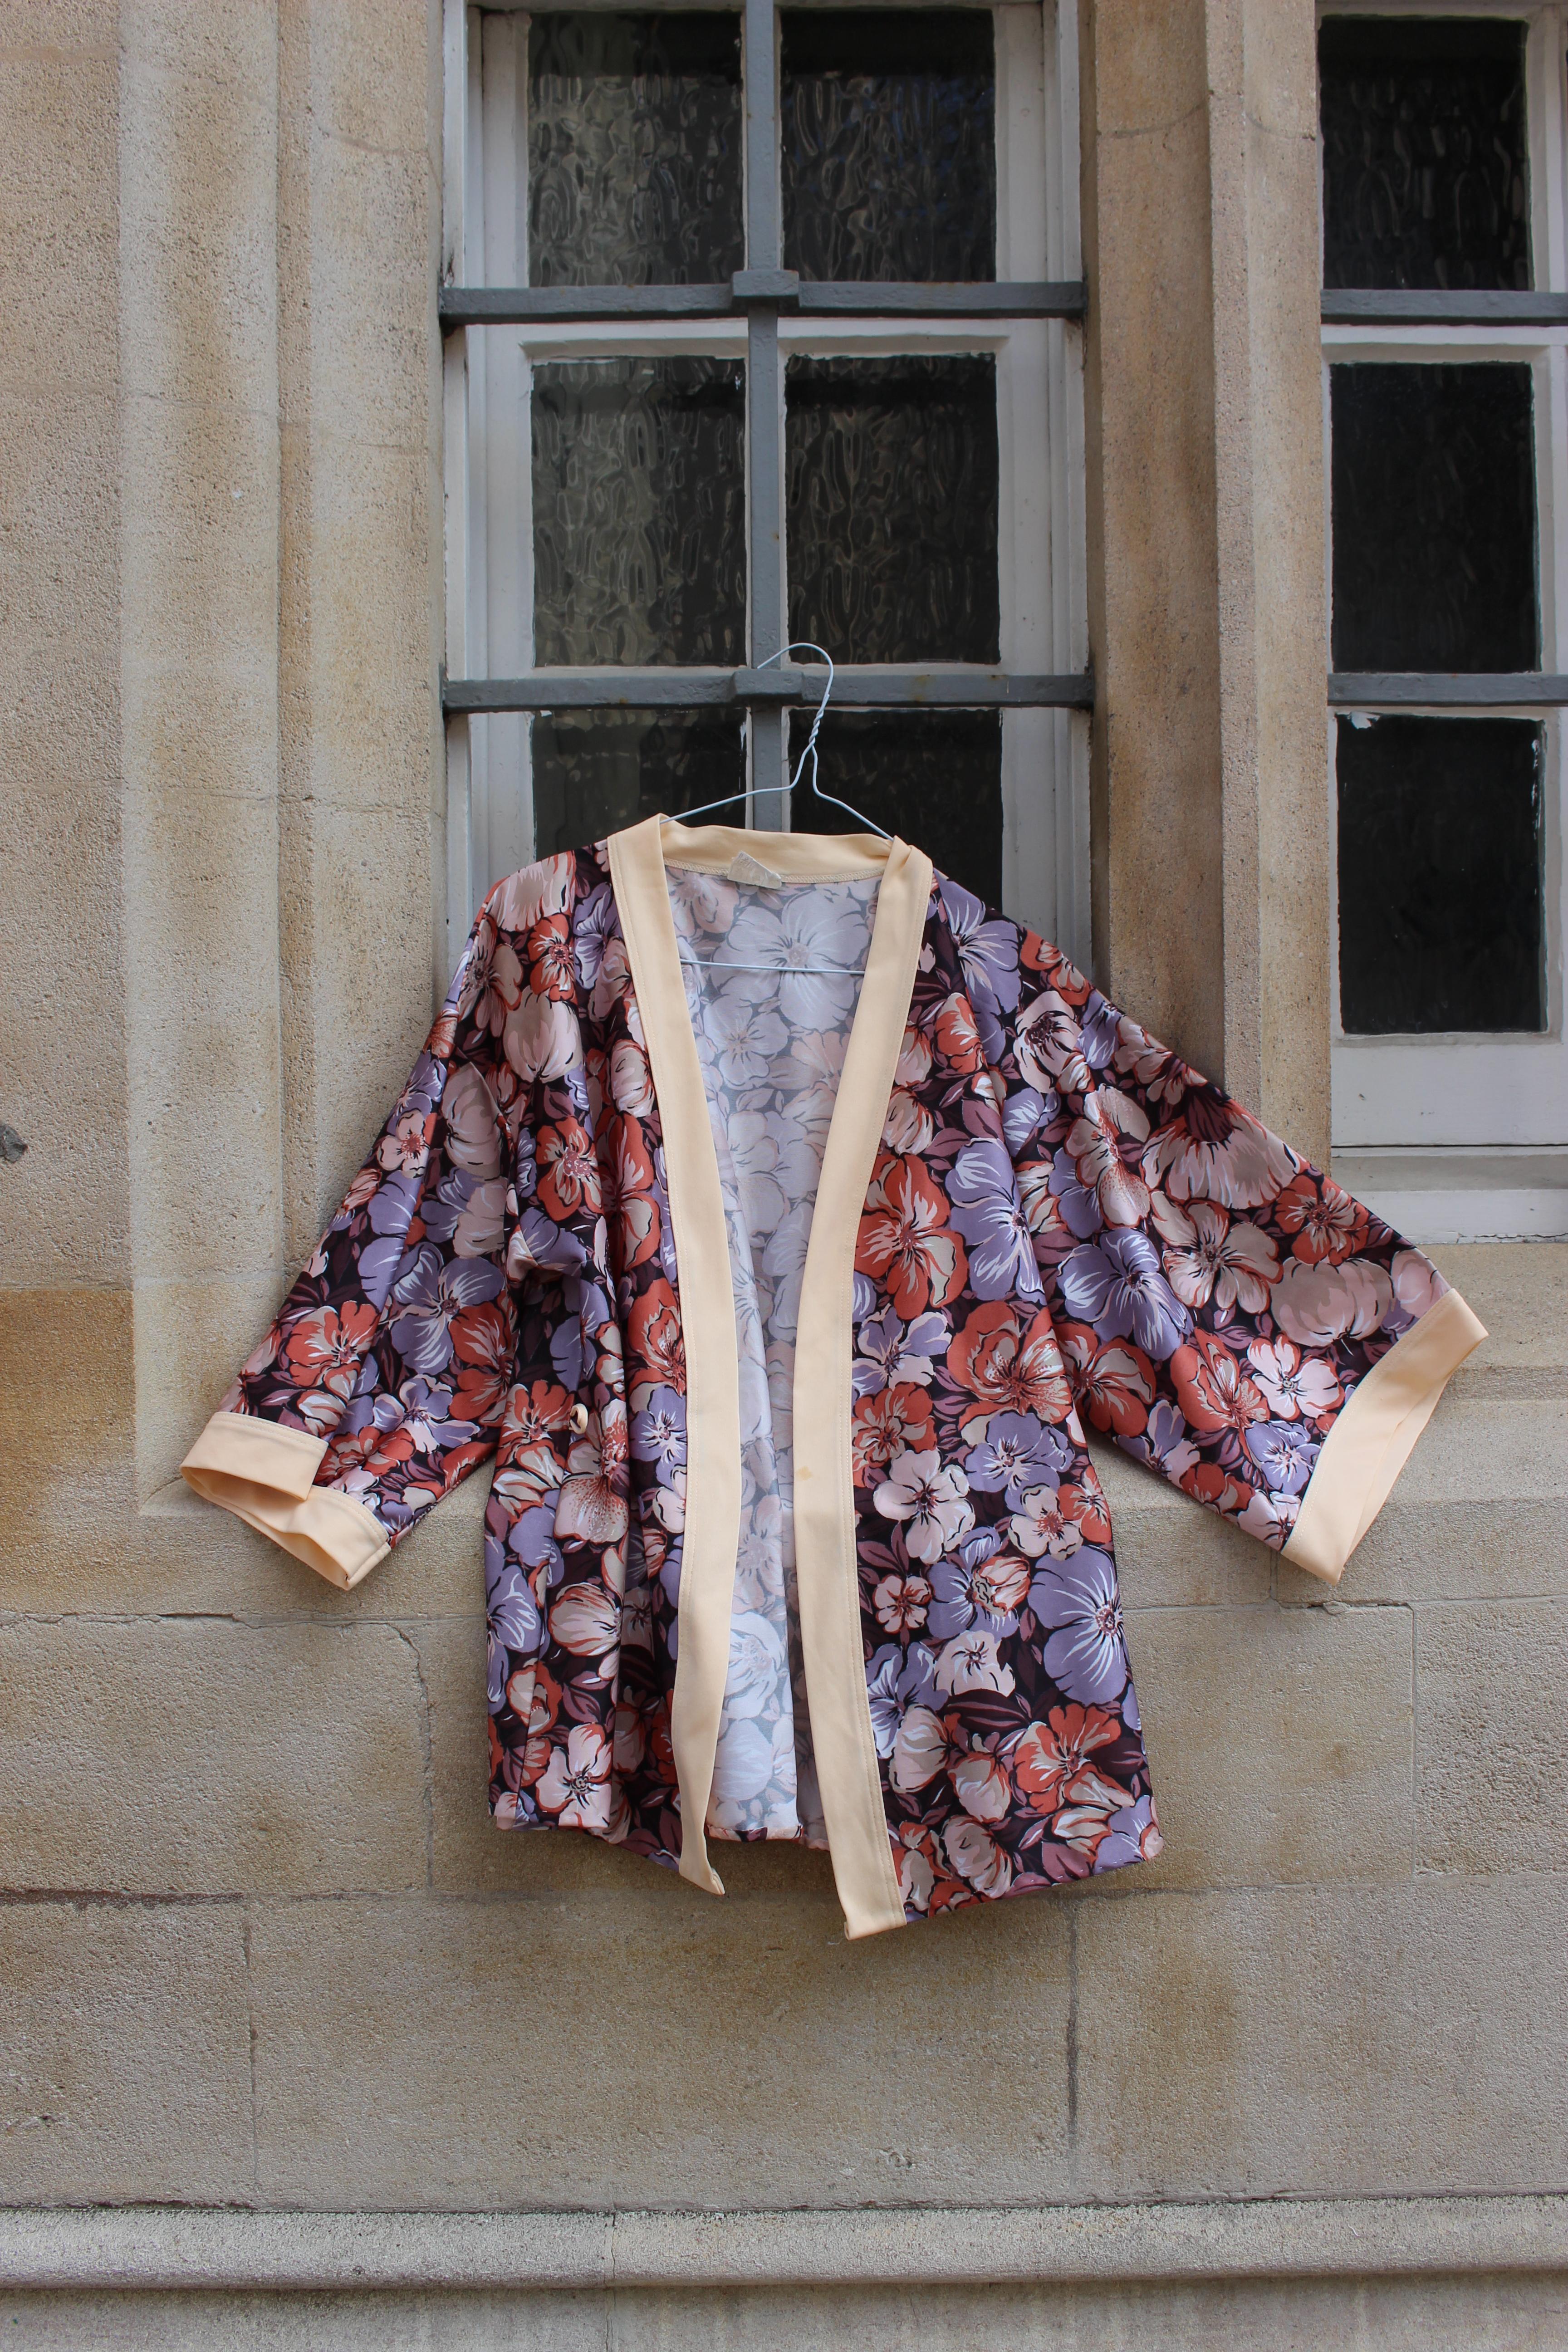 Flowered earth toned kimono top, from Unicorn, 5 Ship Street, Oxford